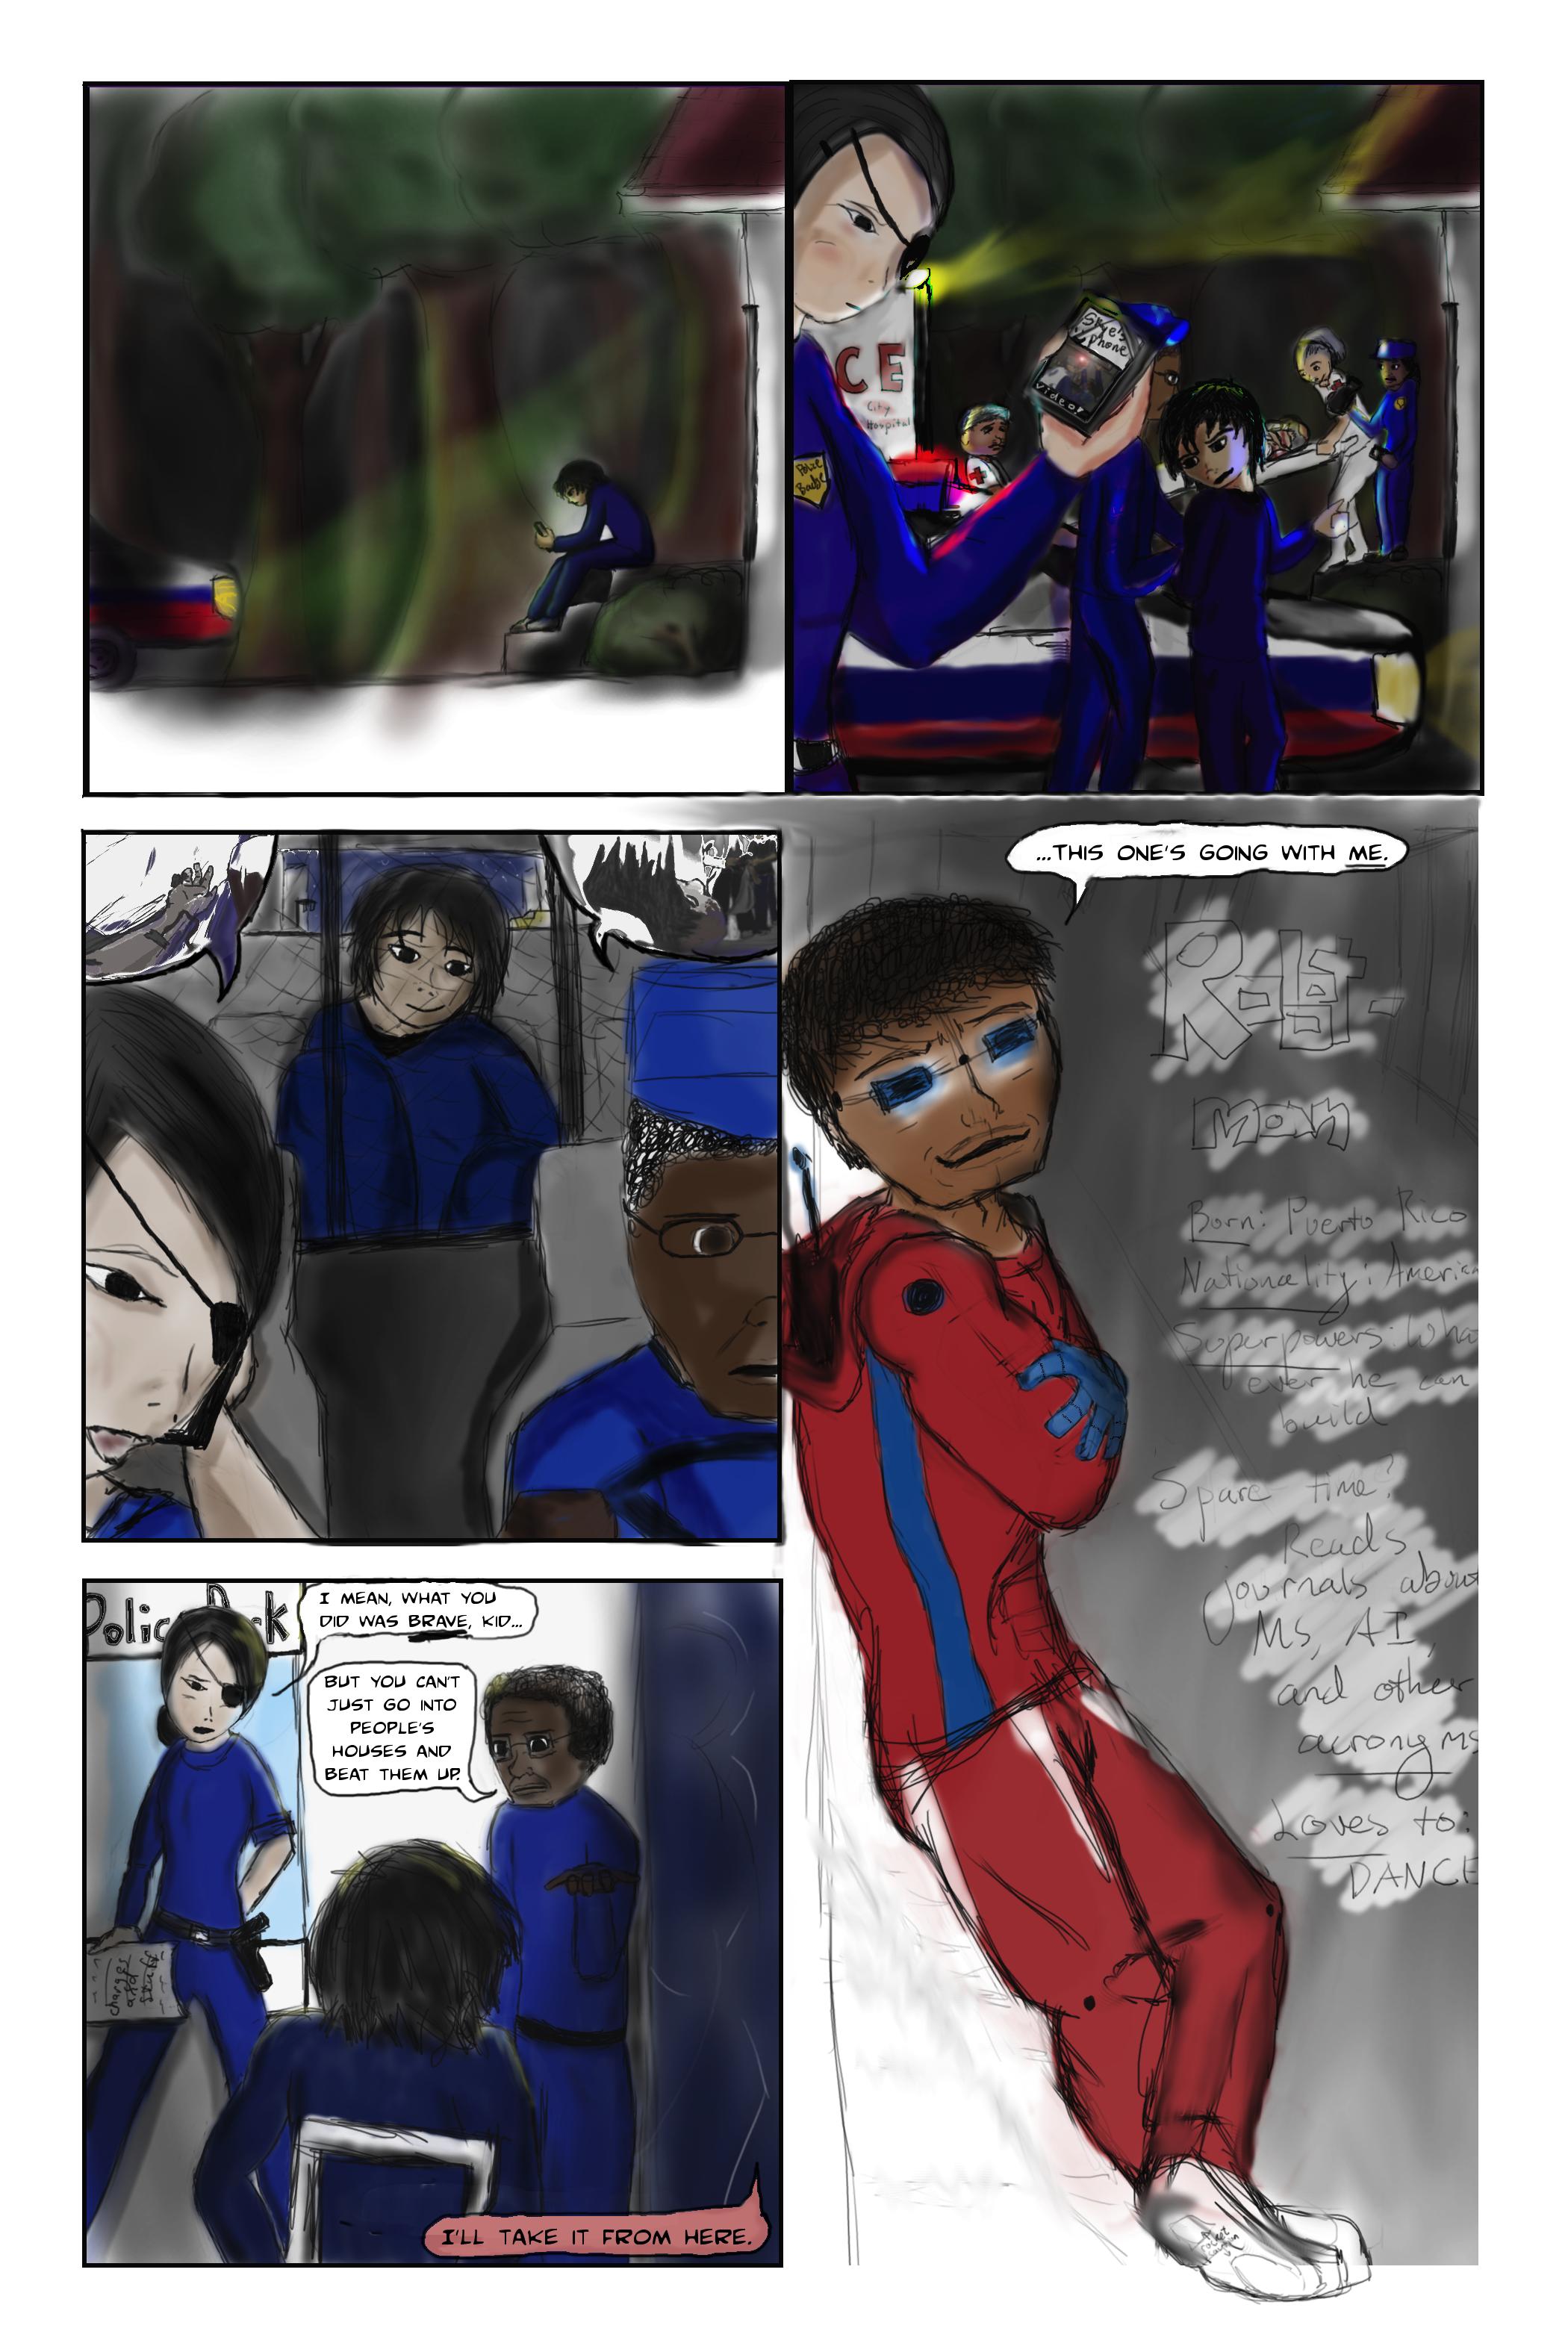 skye origins complete page 9